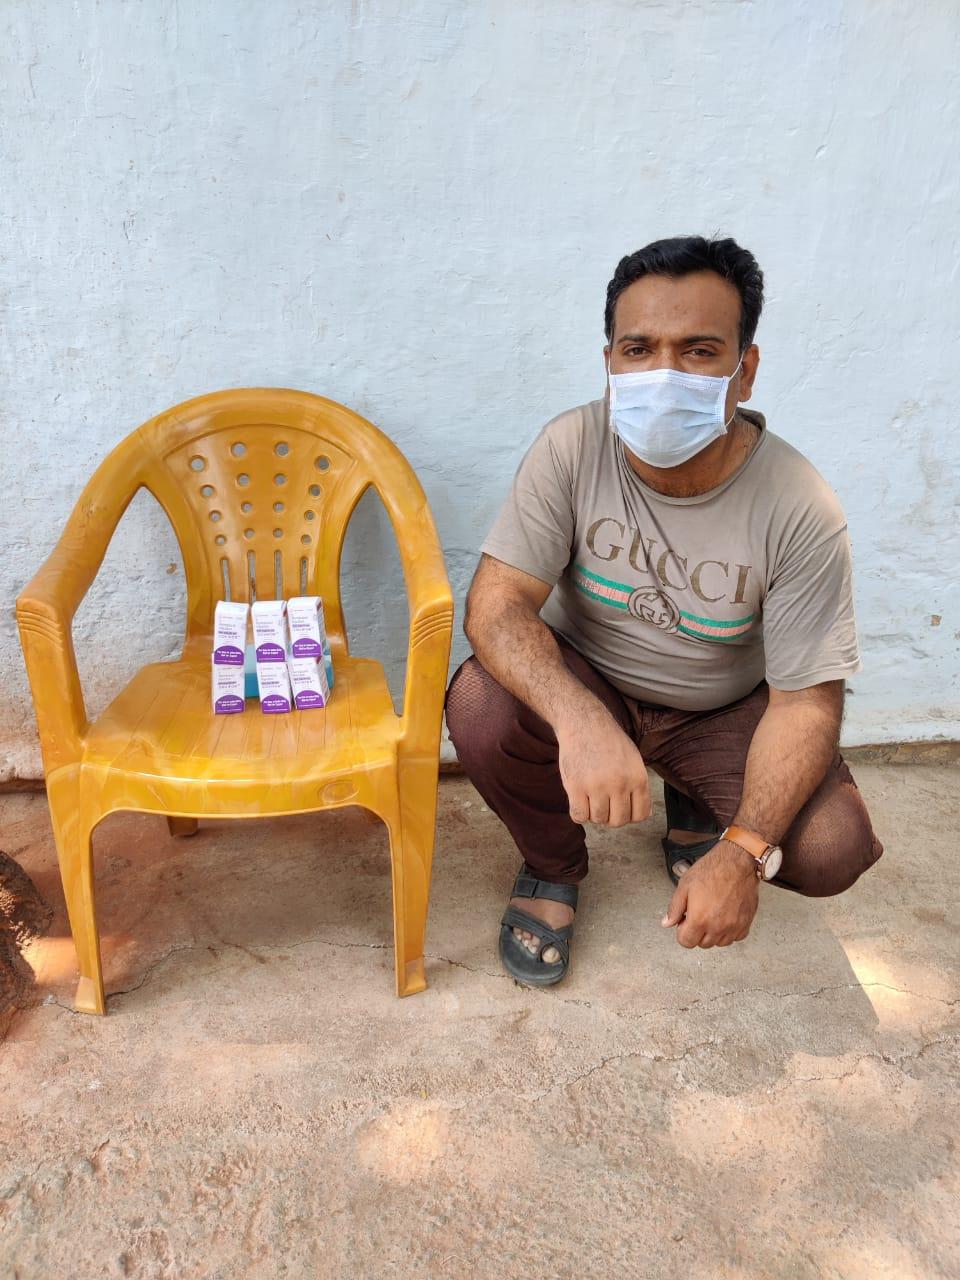 Hyderabad: 2 pharmacy owners black market Remdesivir, arrested